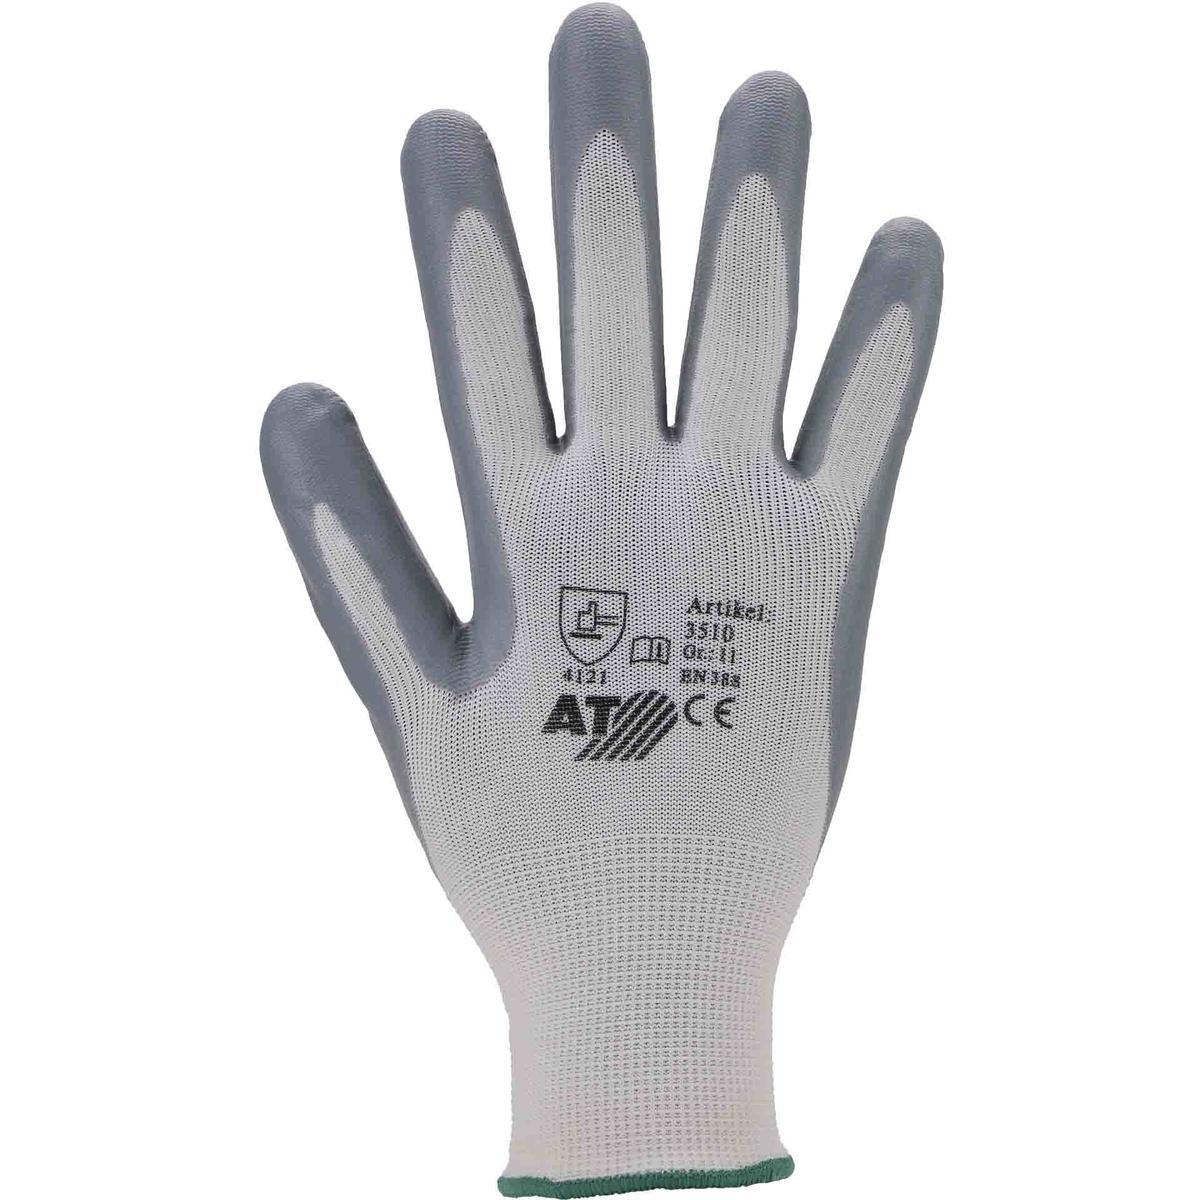 Handschuh 10 Nitril Gr HANTING